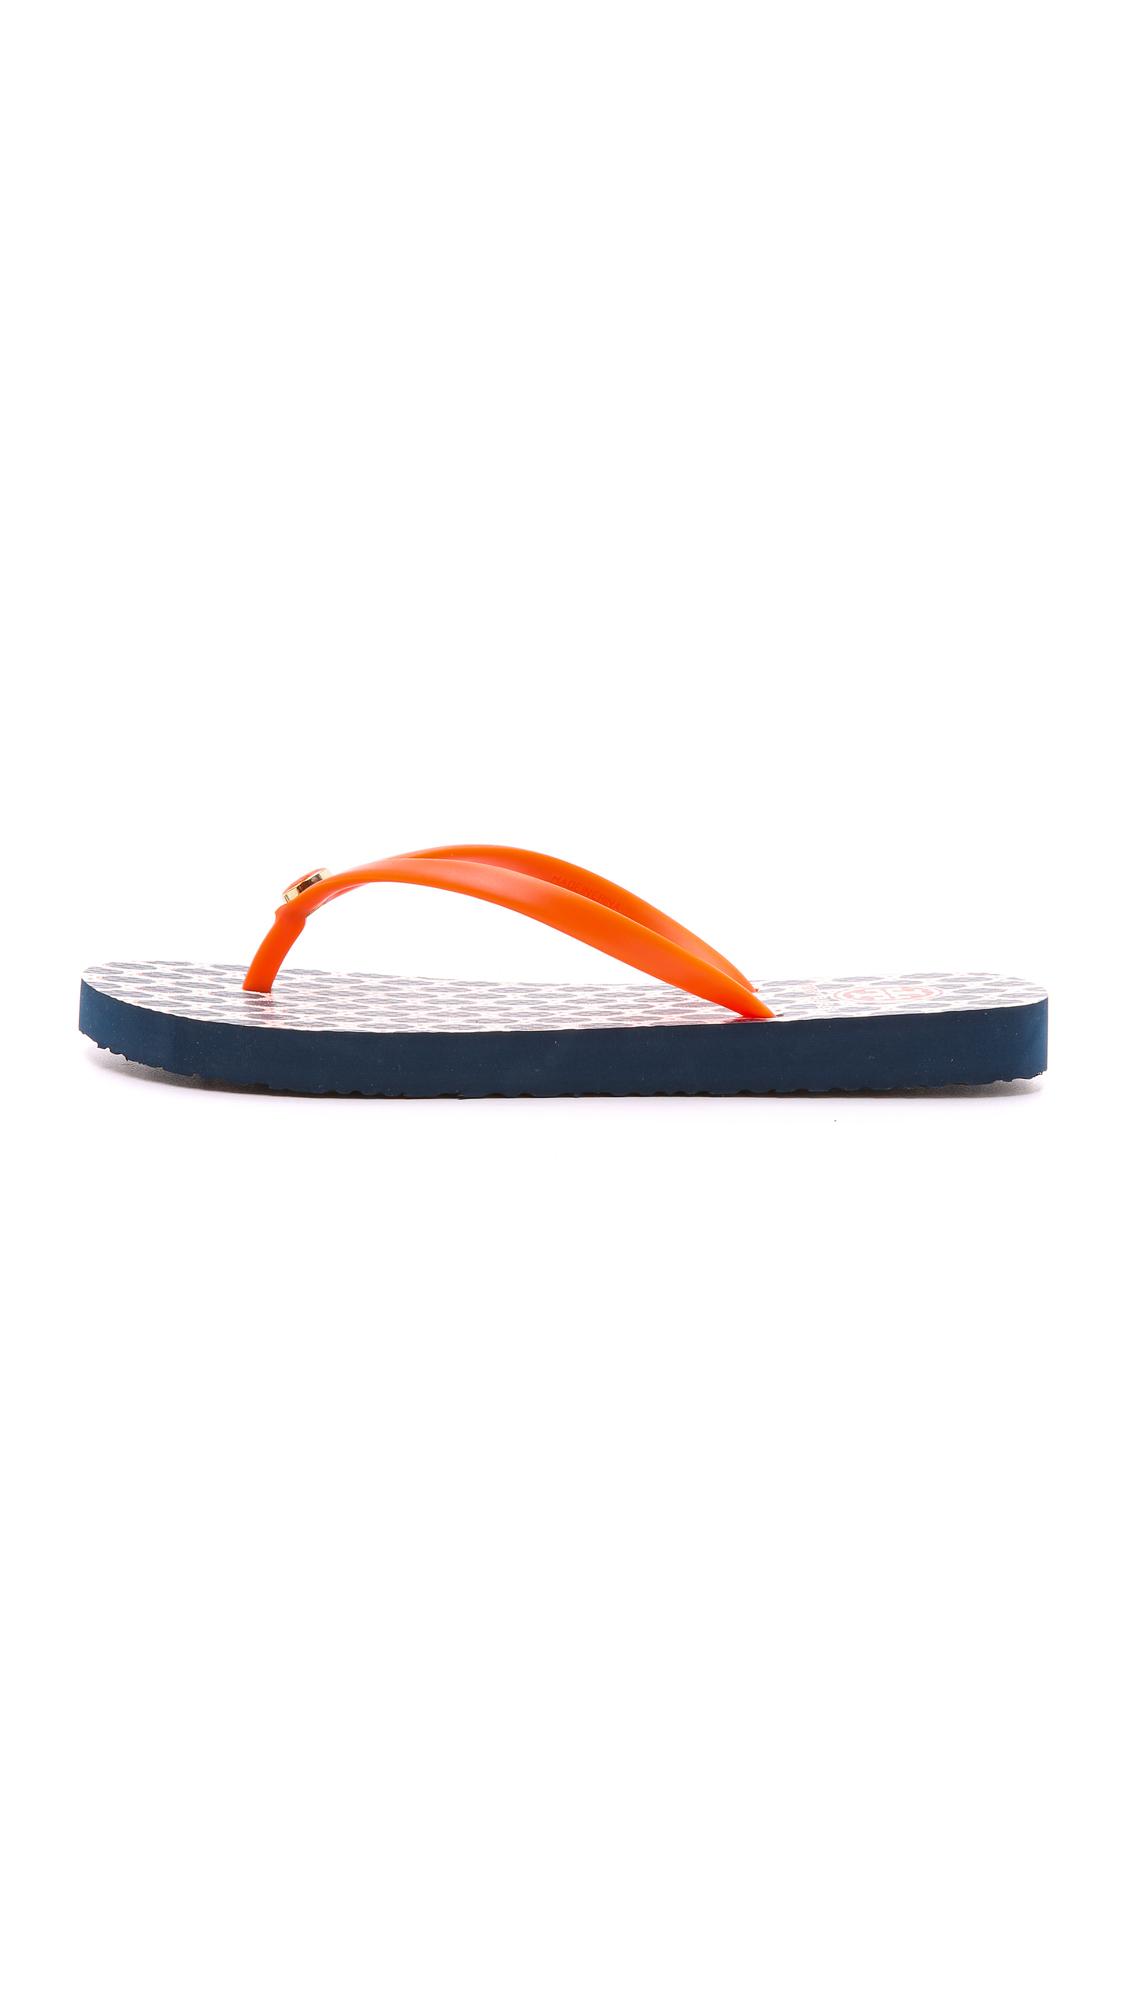 Tory Burch Thin Flip Flops - Sun Coralwooly Dot In Blue -4800